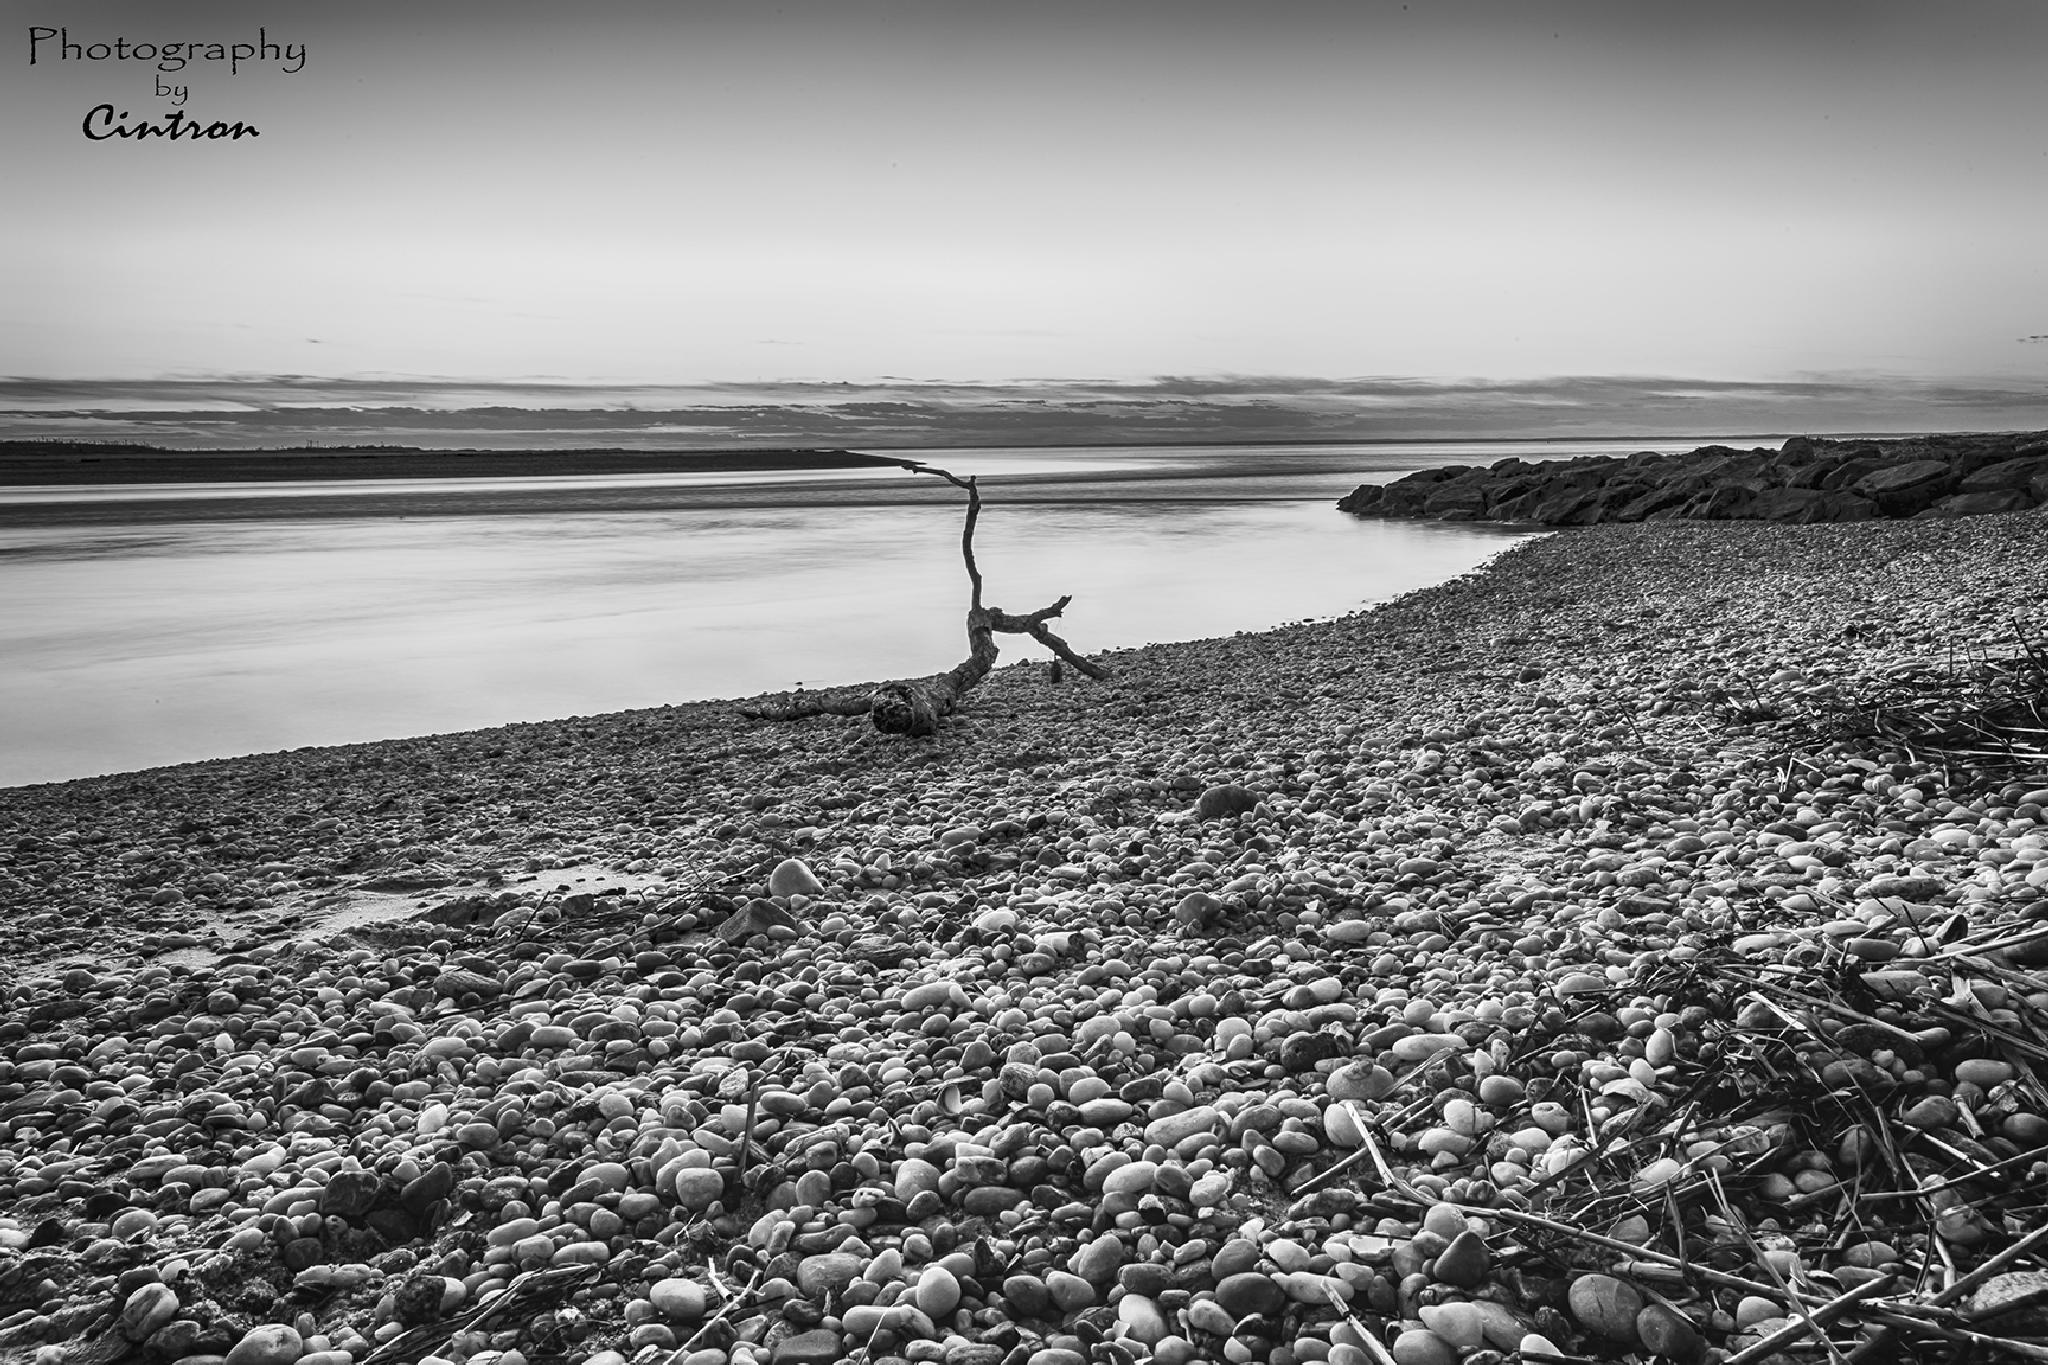 West Meadow Beach by Photographybycintron